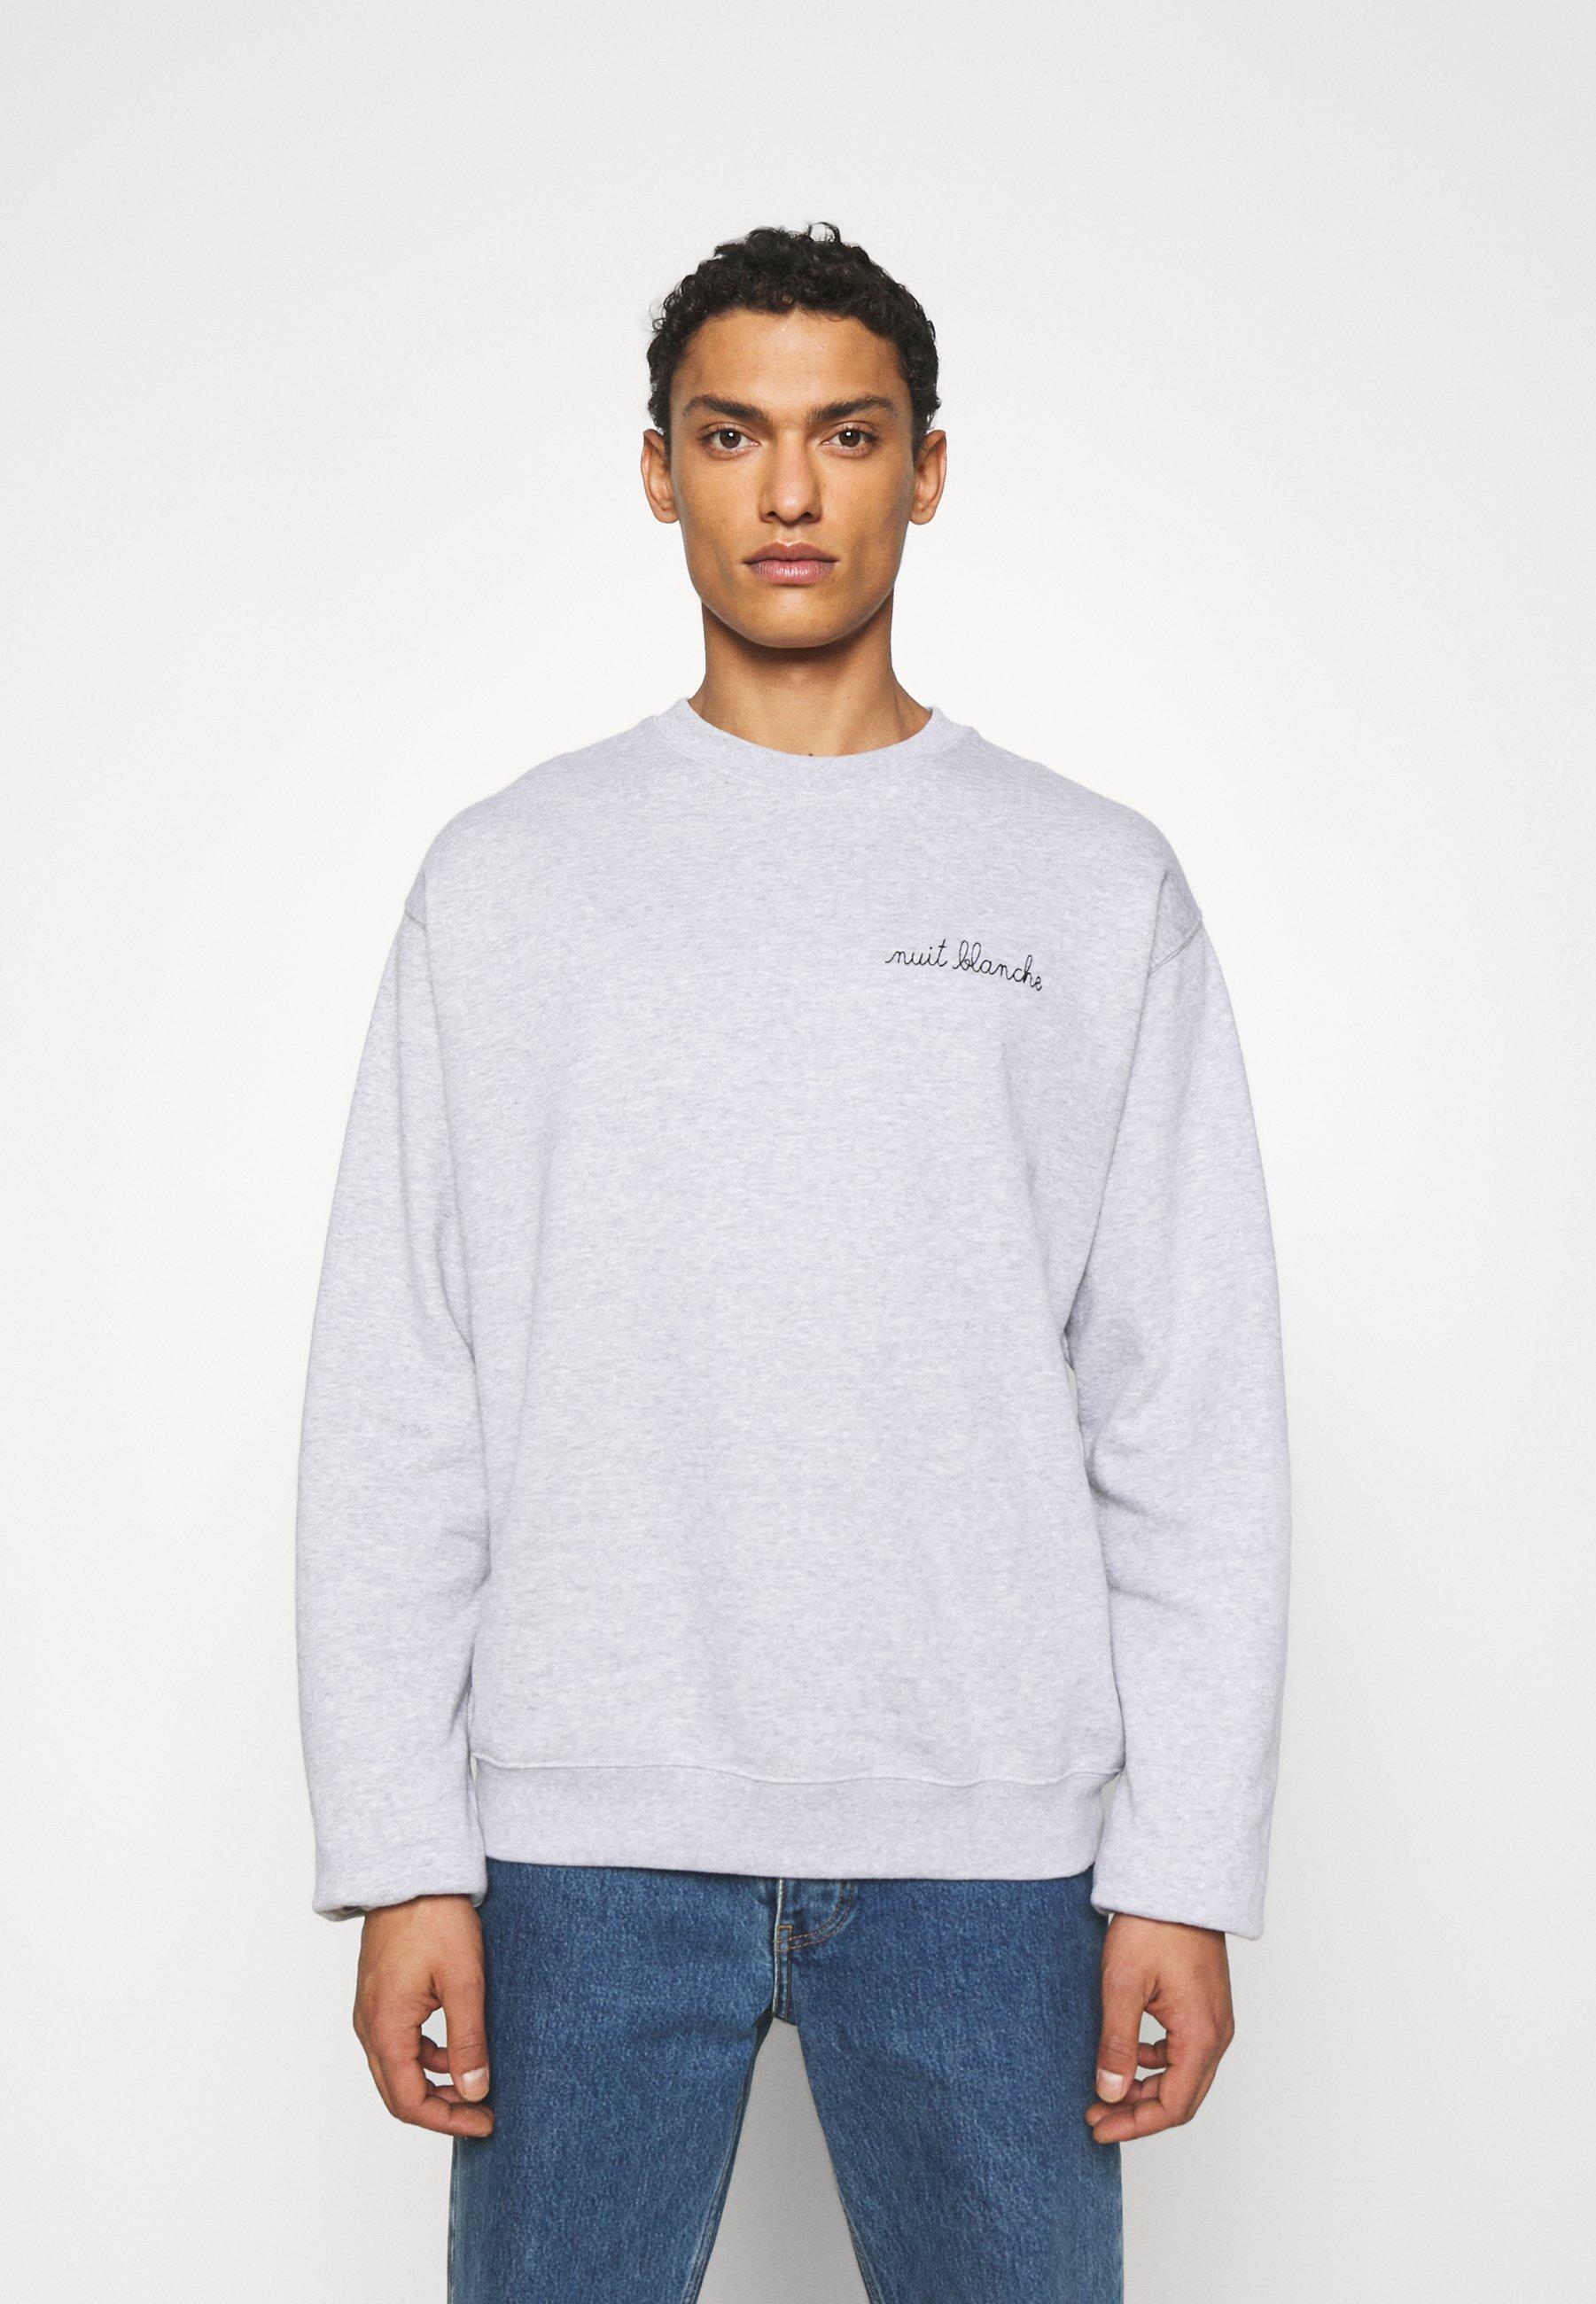 Women LEDRU NUIT BLANCHE UNISEX - Sweatshirt